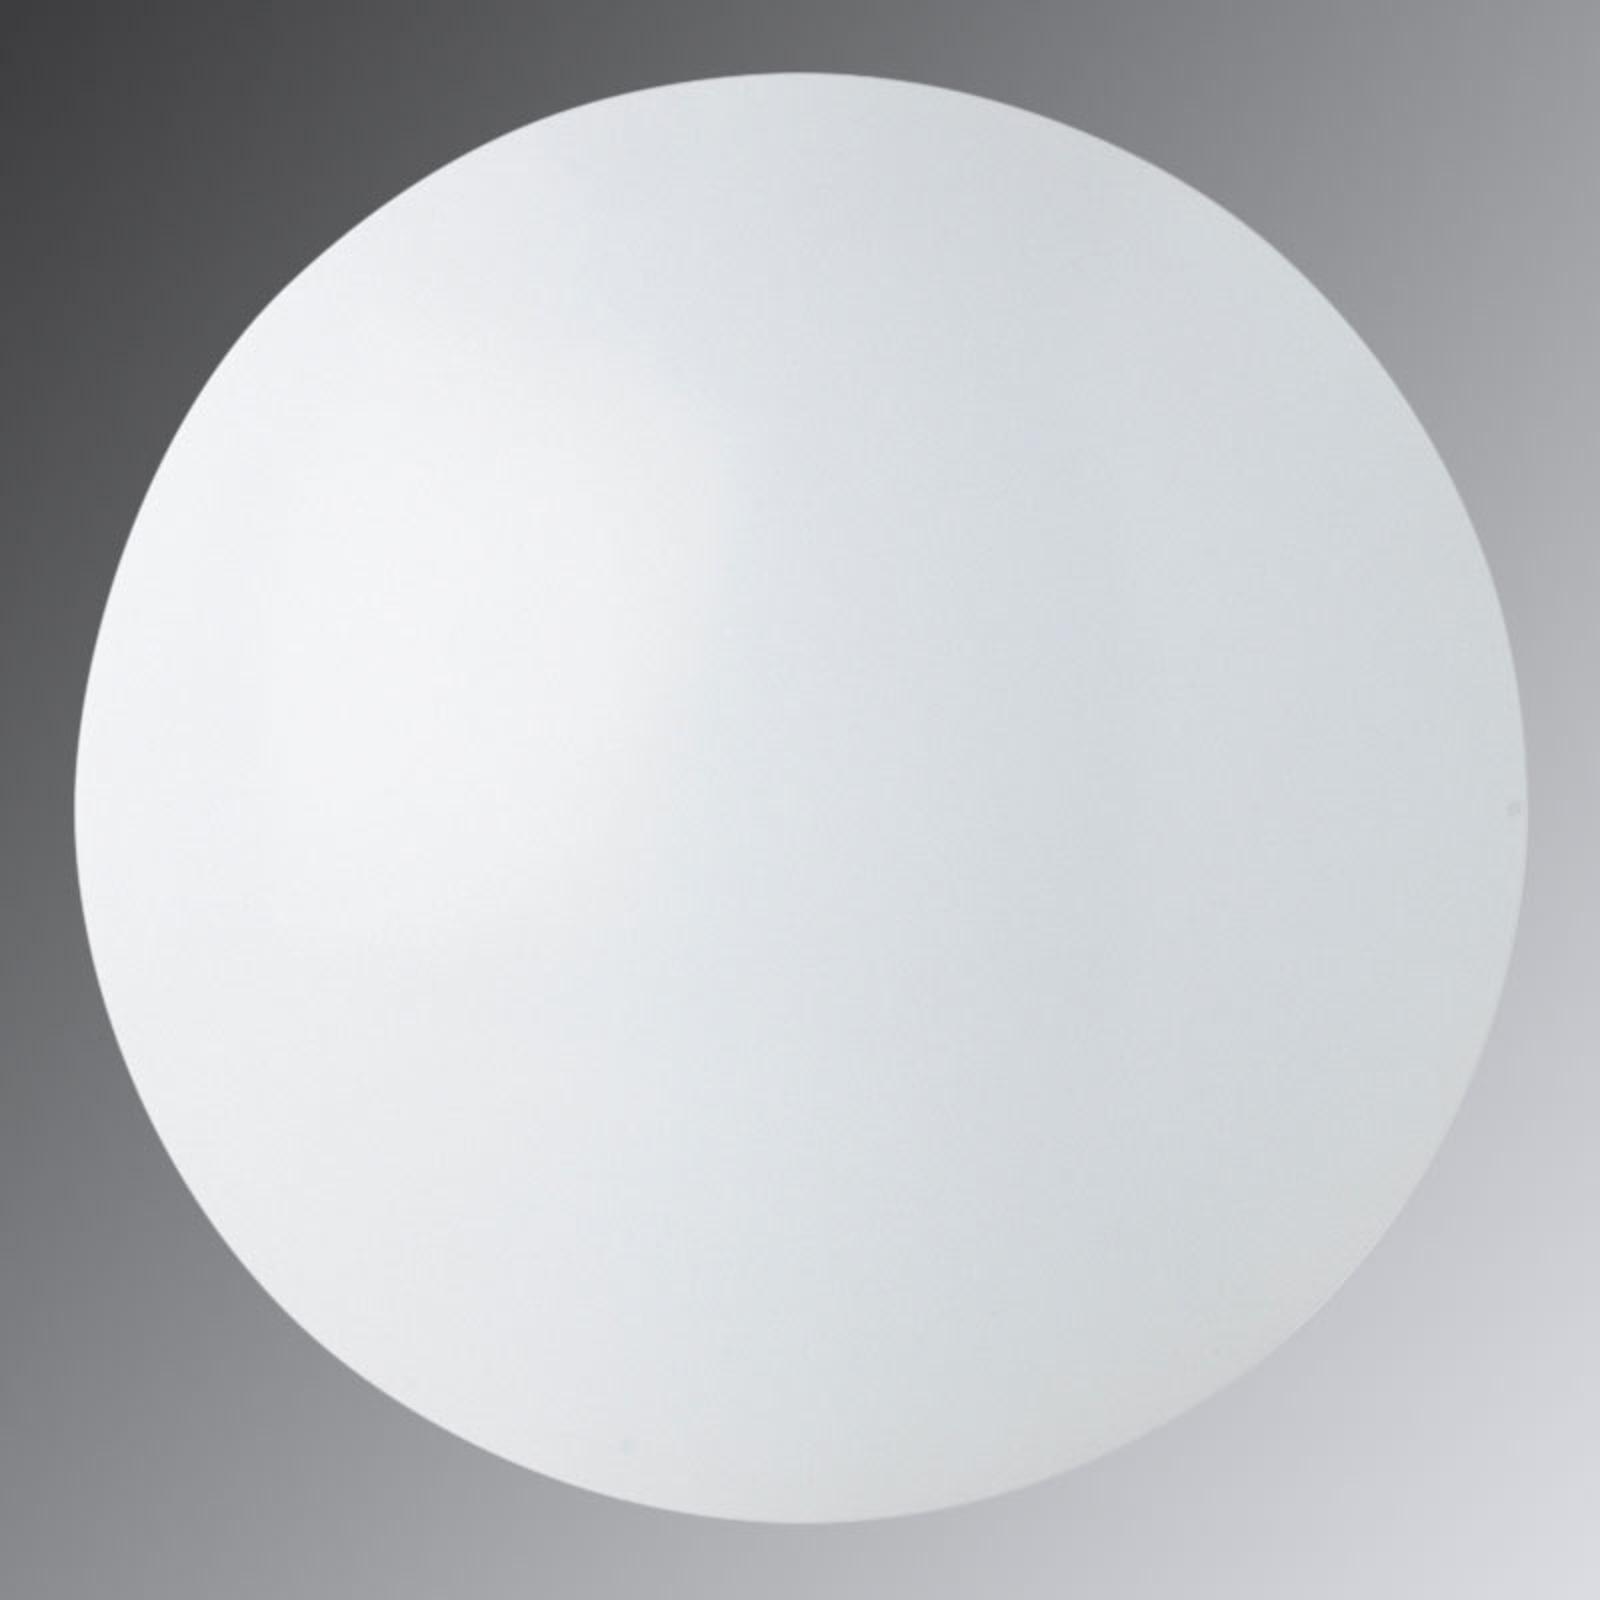 Renzo skiftesikker LED-taklampe, 22 W, 3 000 K